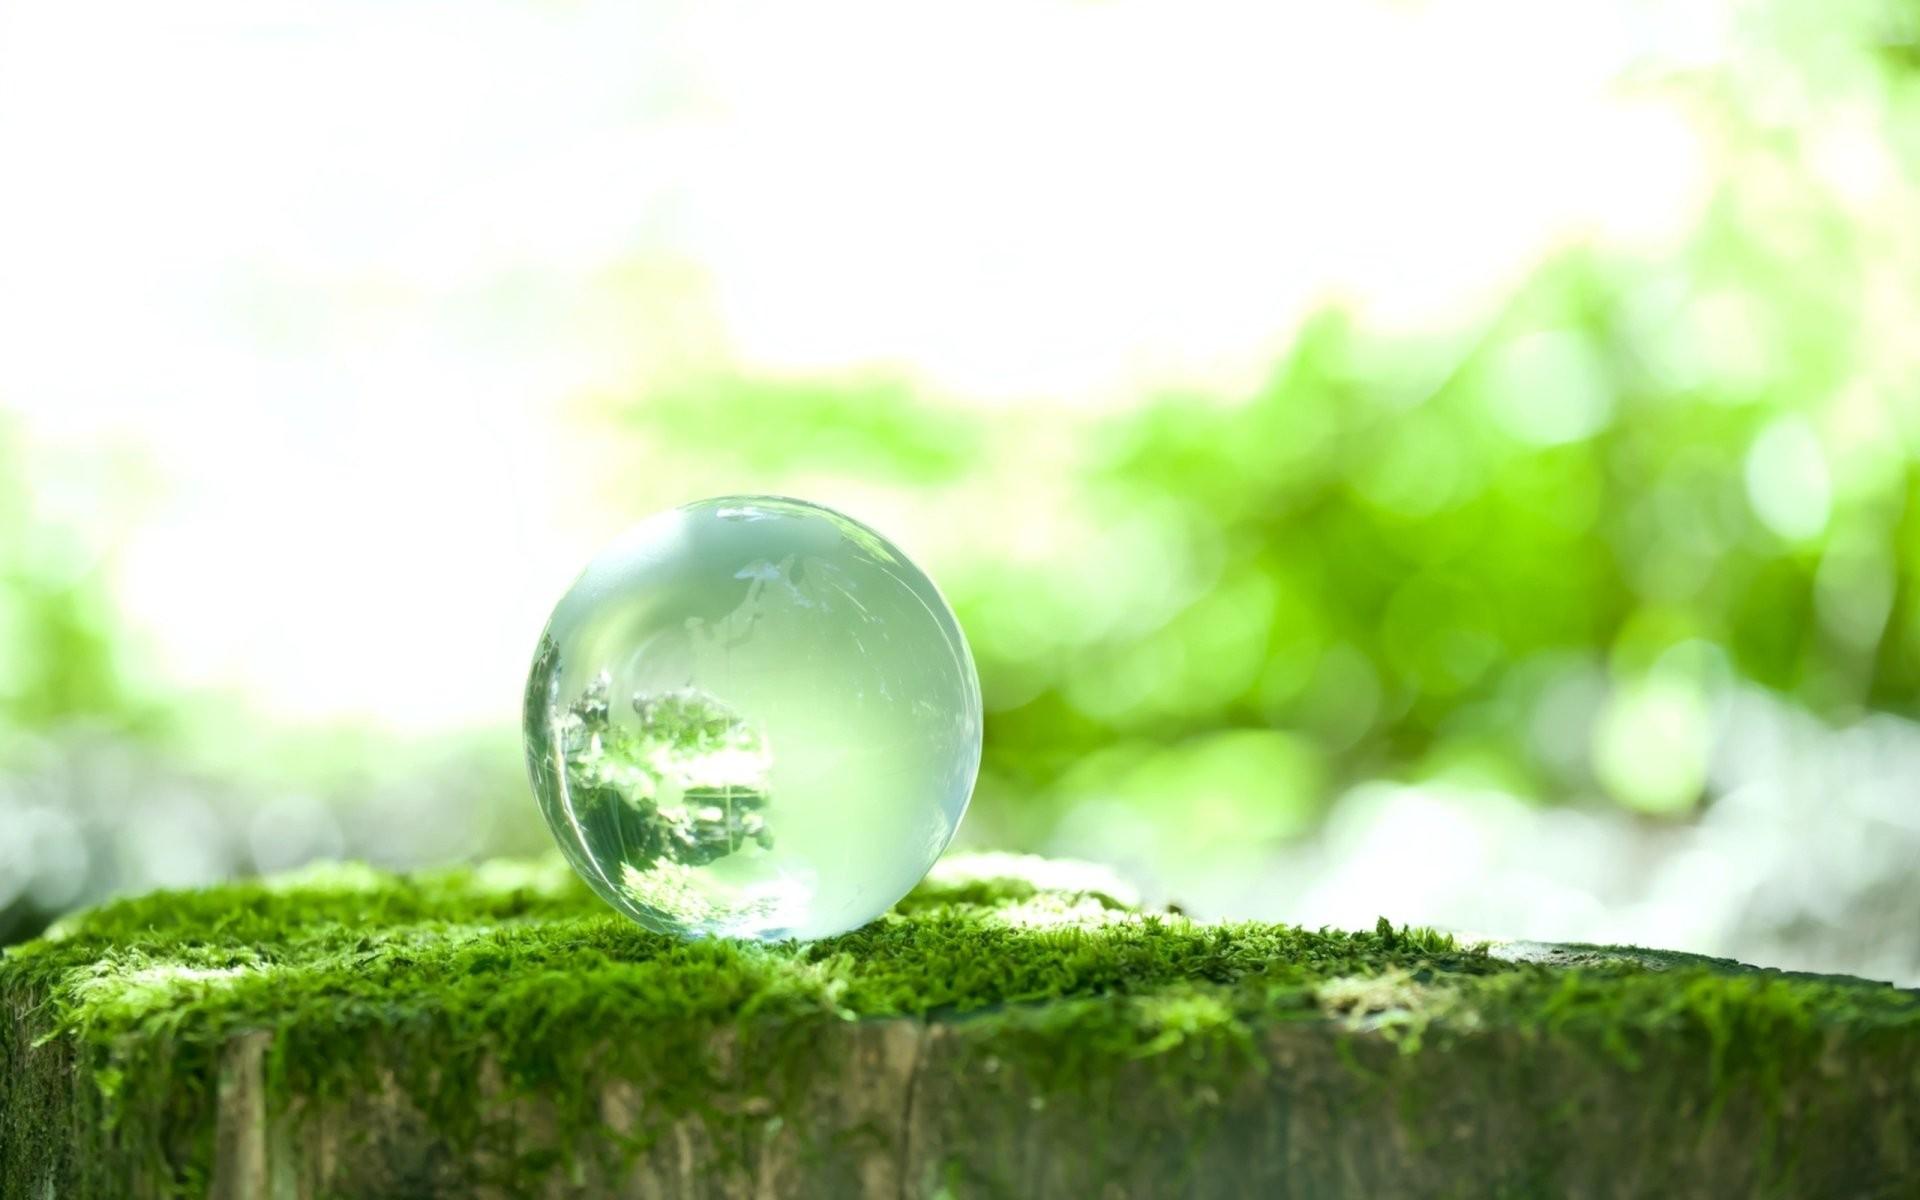 Glass, Bokeh, Colors, Abstract Wallpapers, Marble, - ภาพ พื้น หลัง น้ำ ธรรมชาติ - HD Wallpaper